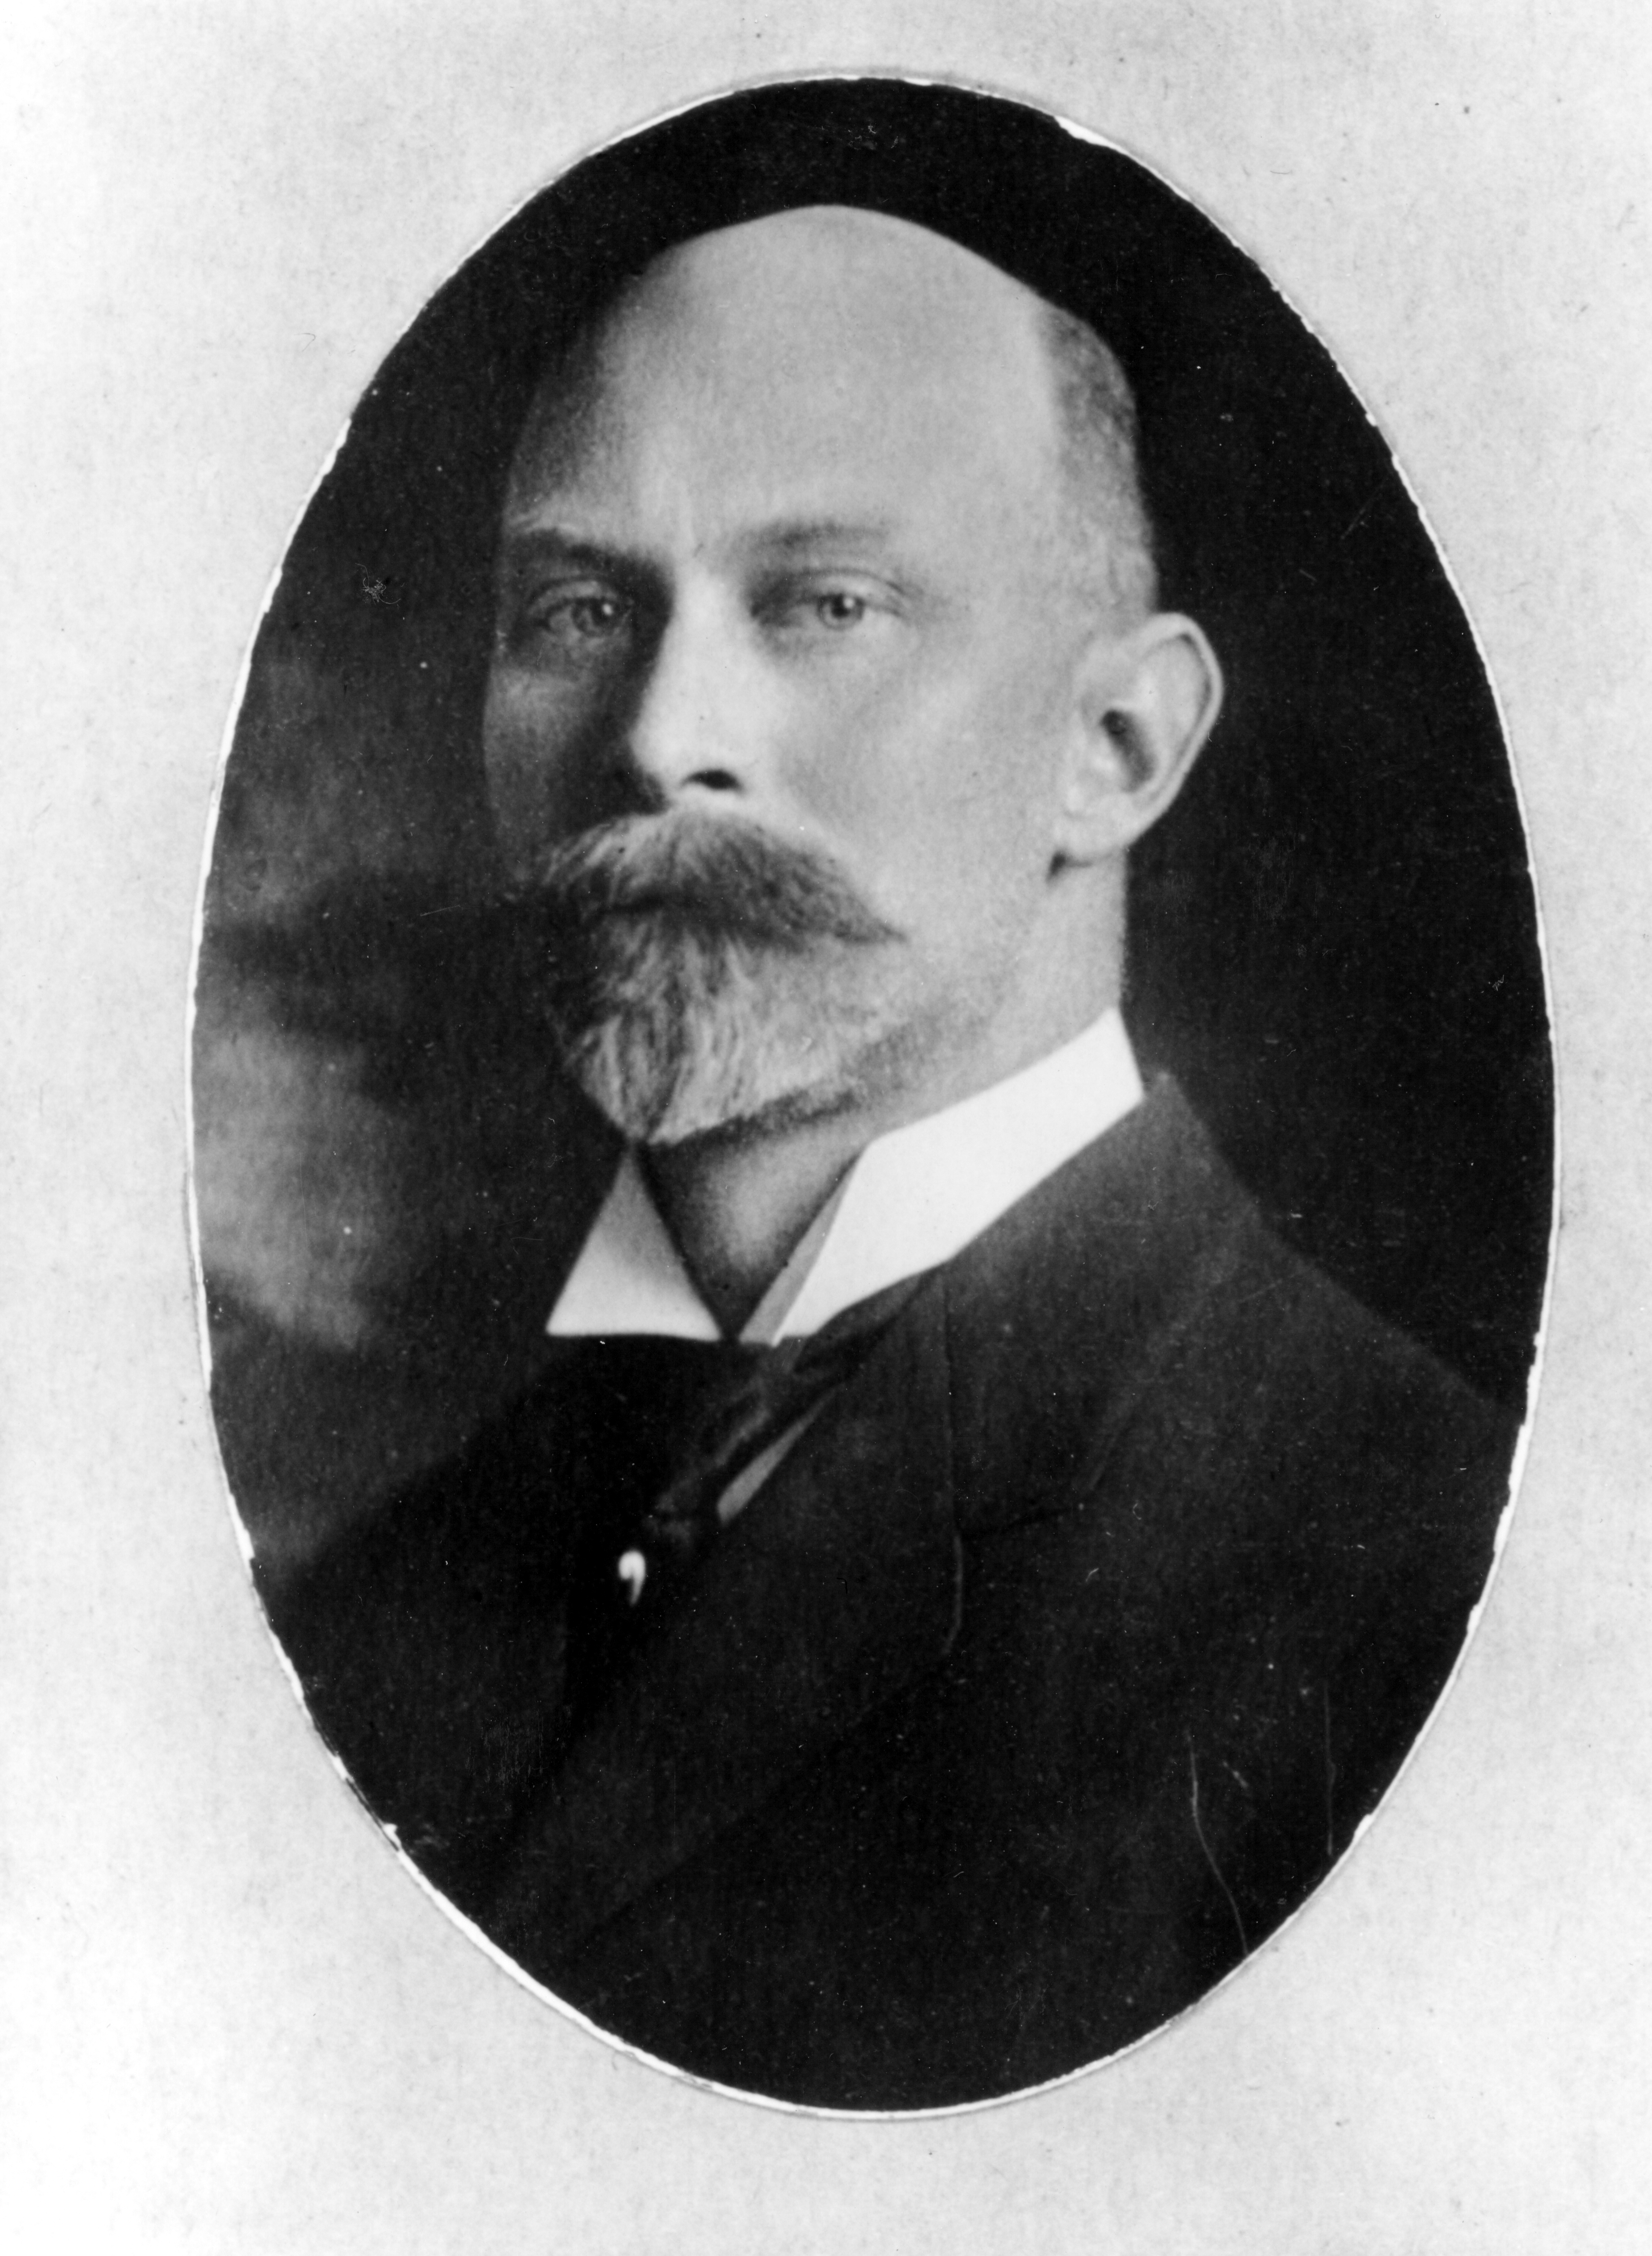 Thomas Wayland Vaughan